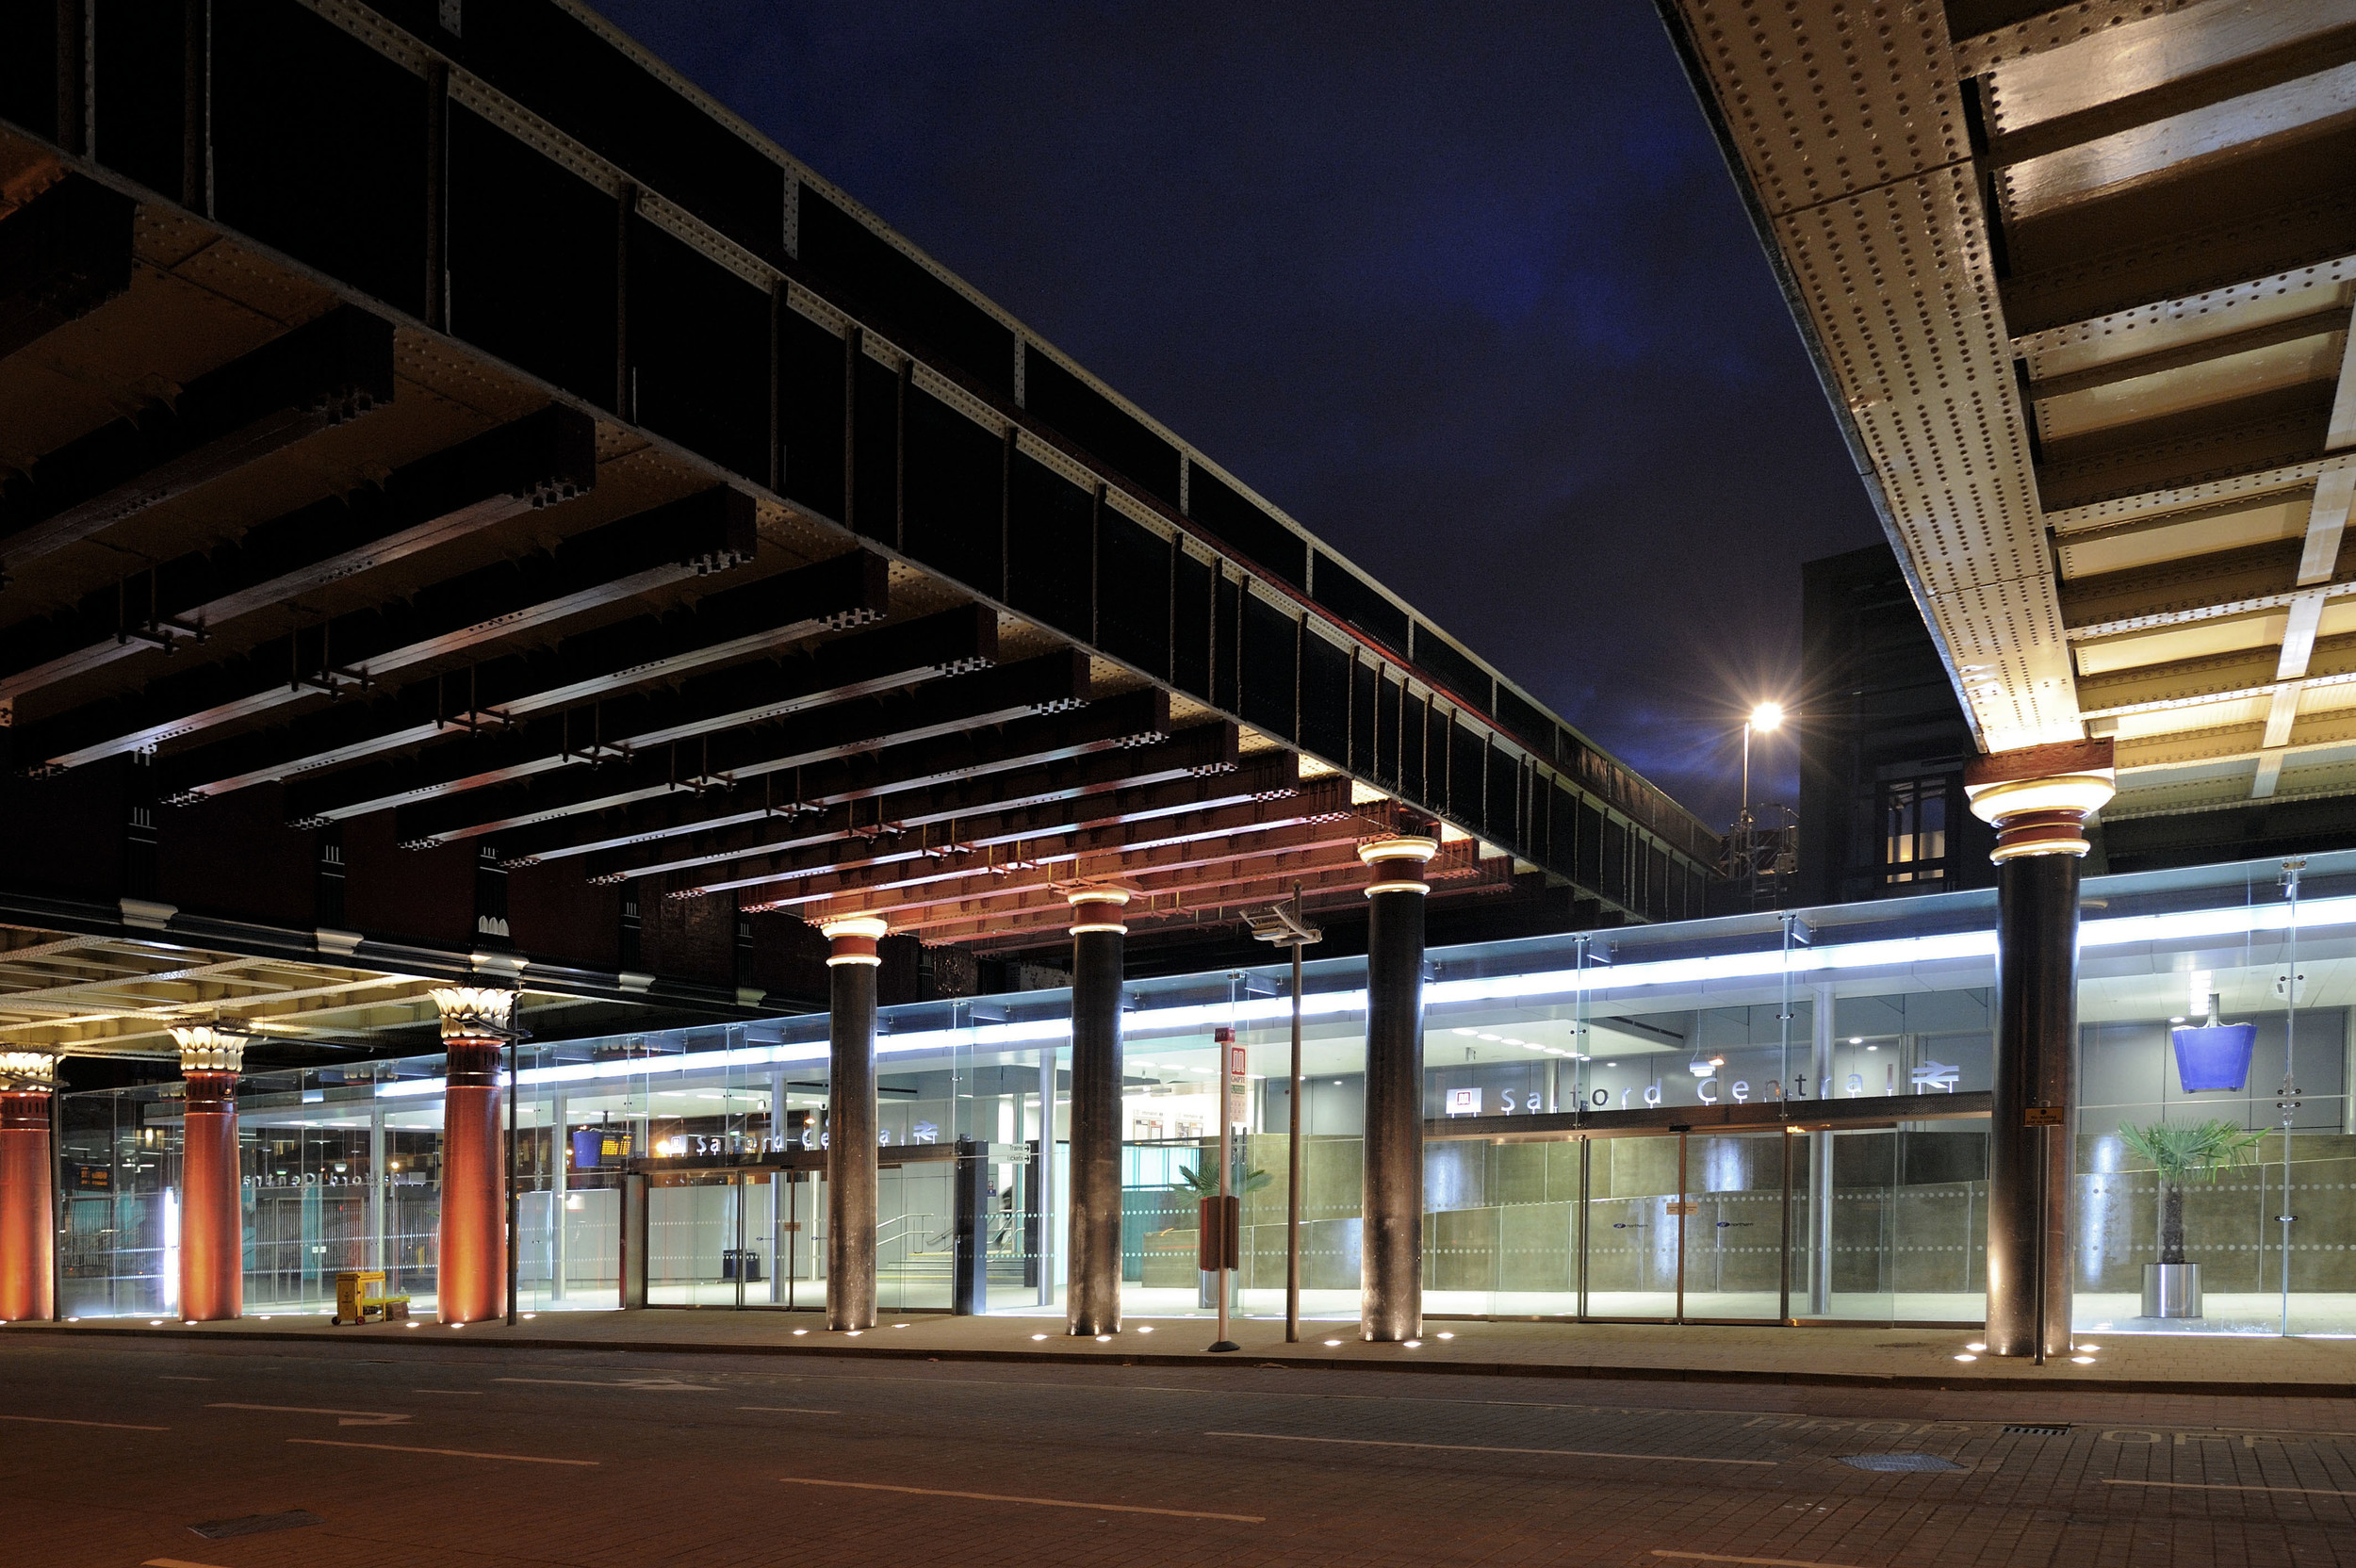 Salford Central Station at Night 3